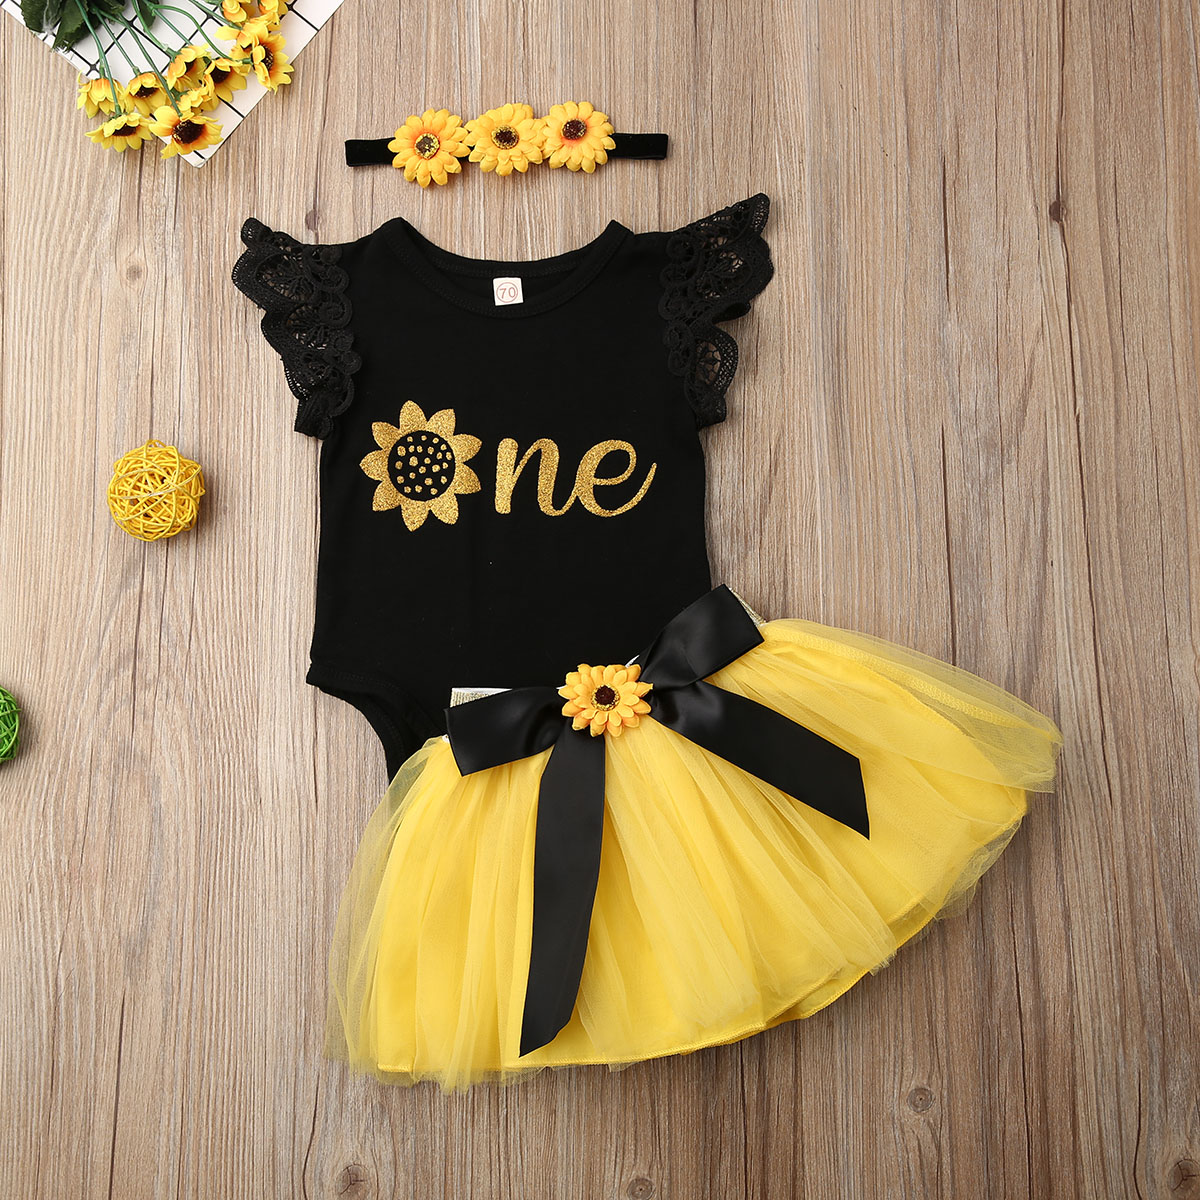 Pudcoco Newborn Baby Girl Clothes My 1st Birthday Lace Ruffle Sleeveless Romper Tops Mini Tulle Skirt Headband 3Pcs Outfits Set